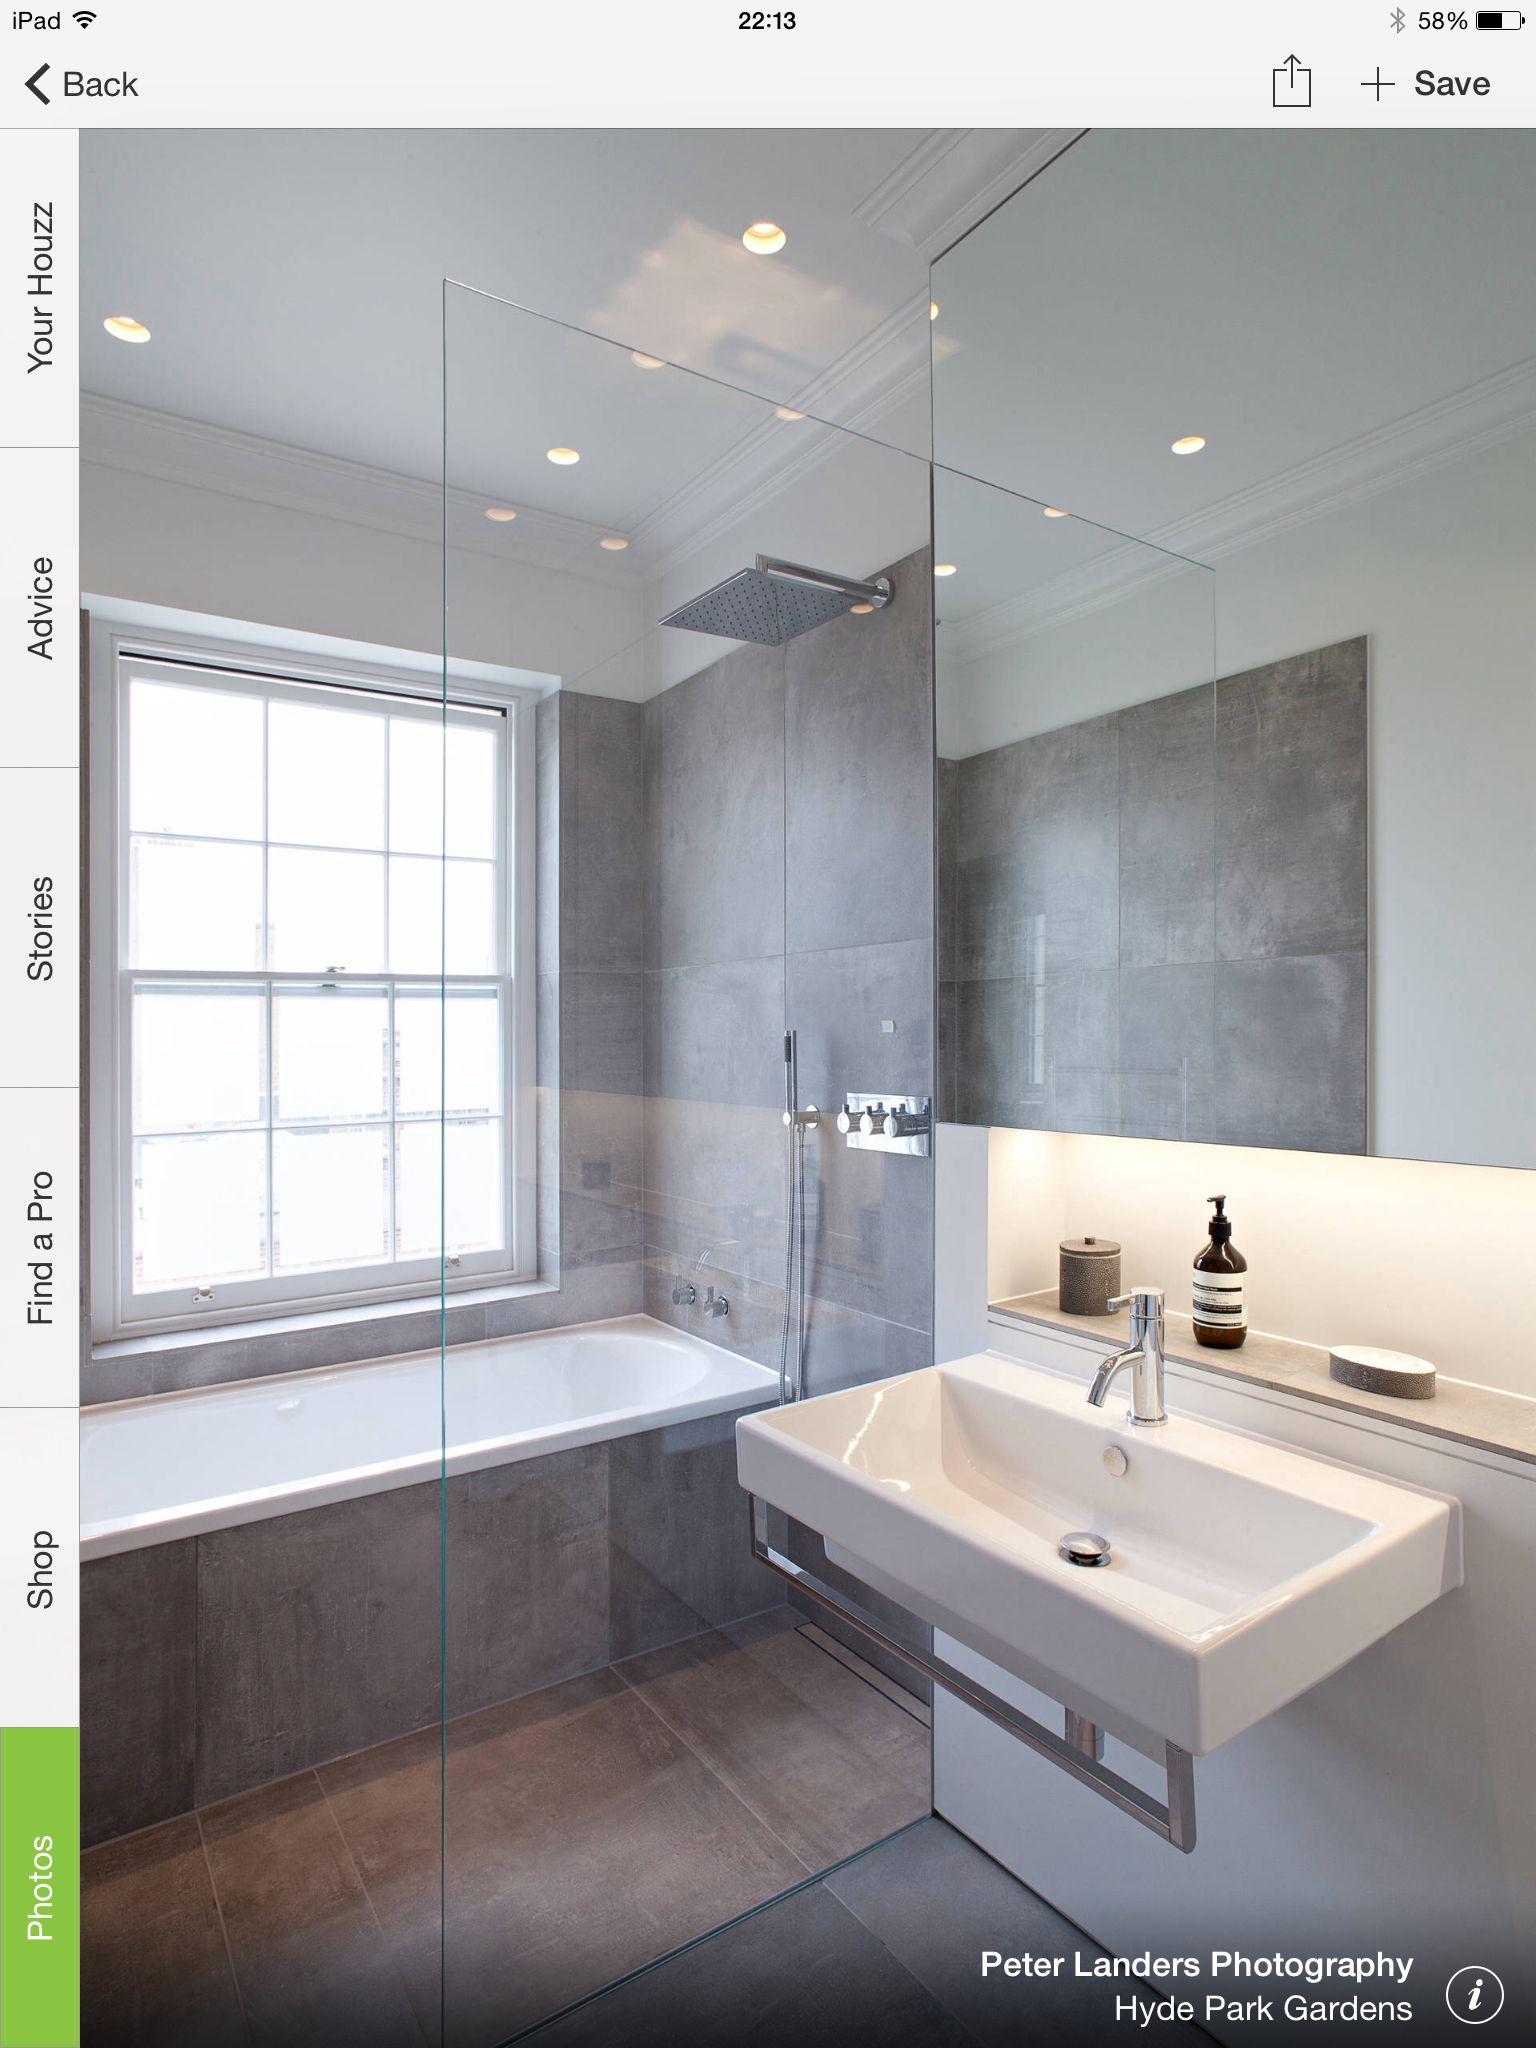 Pin By Veness On Design Cornerhouzz and Bathroom